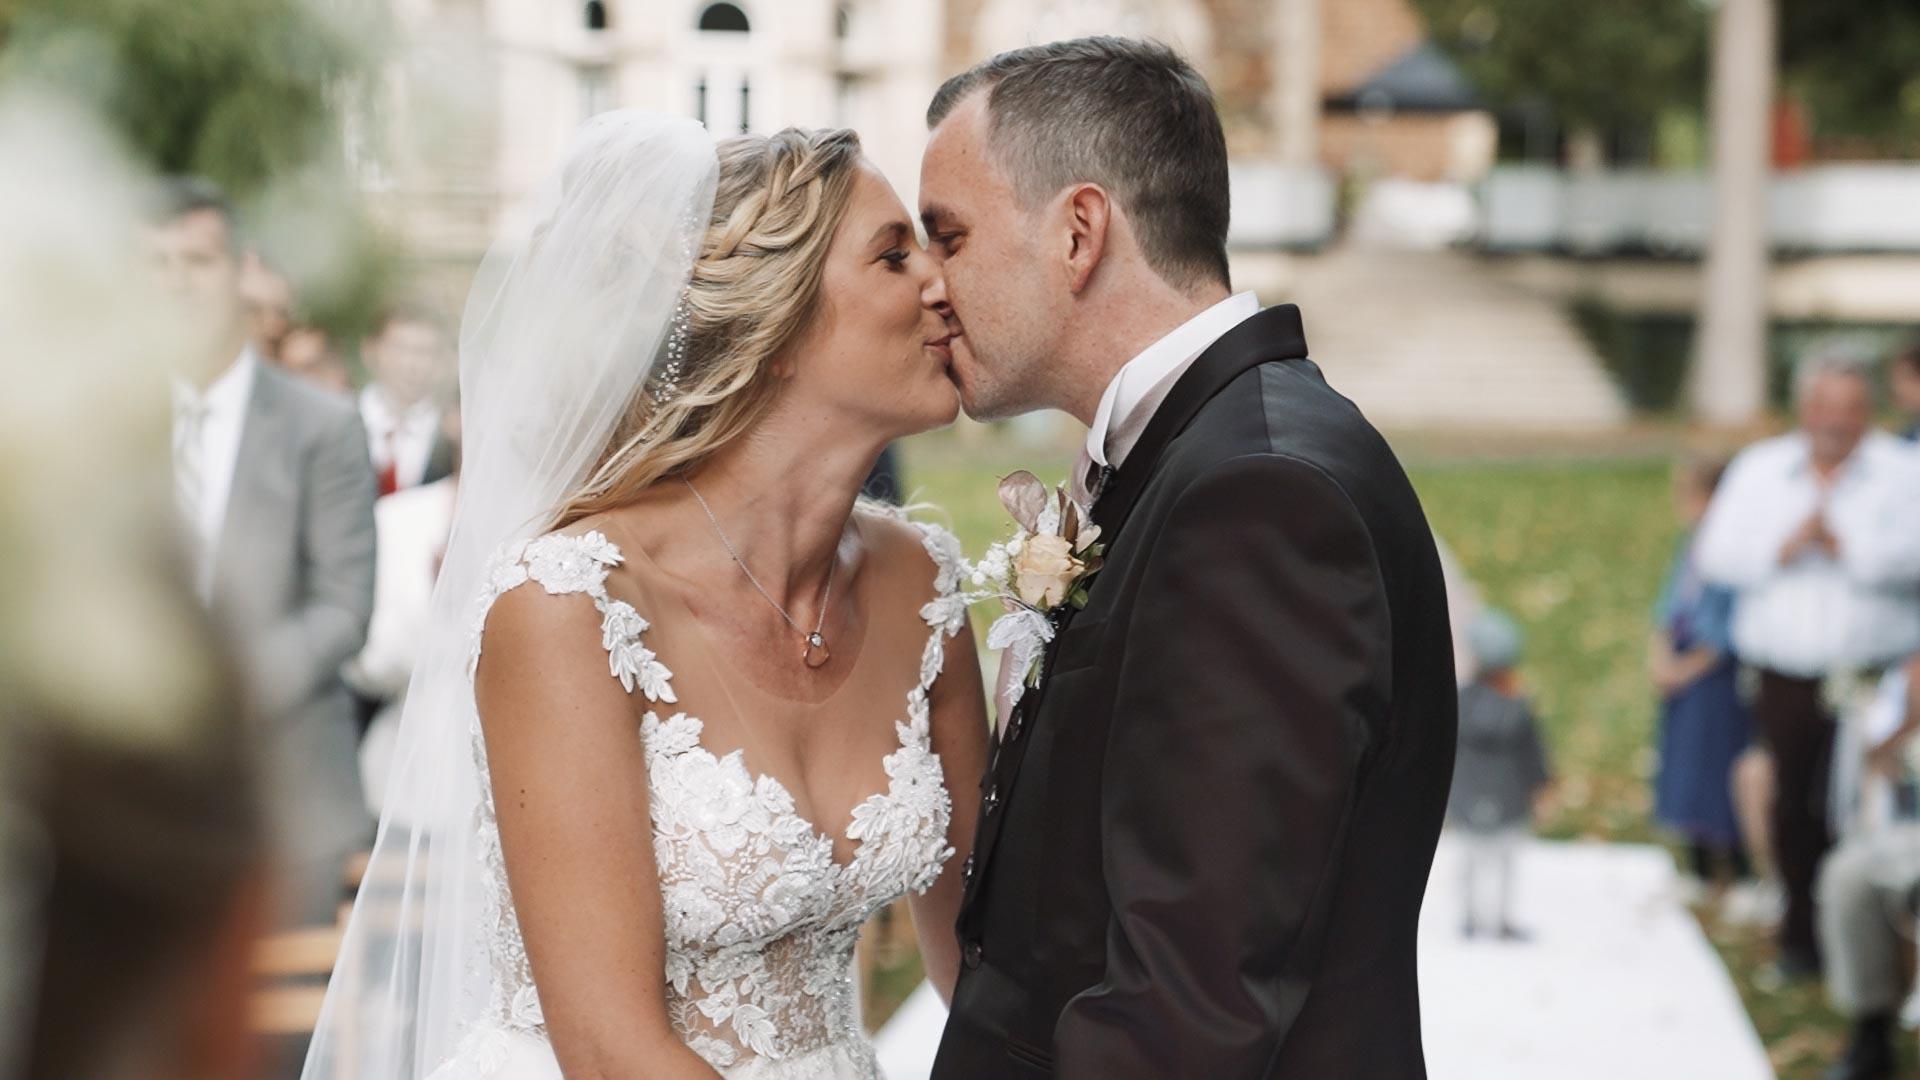 Pascal & Jenny Hochzeitsfilm Schloss Vettelhoven Videograf Hochzeit Filmemacher 048